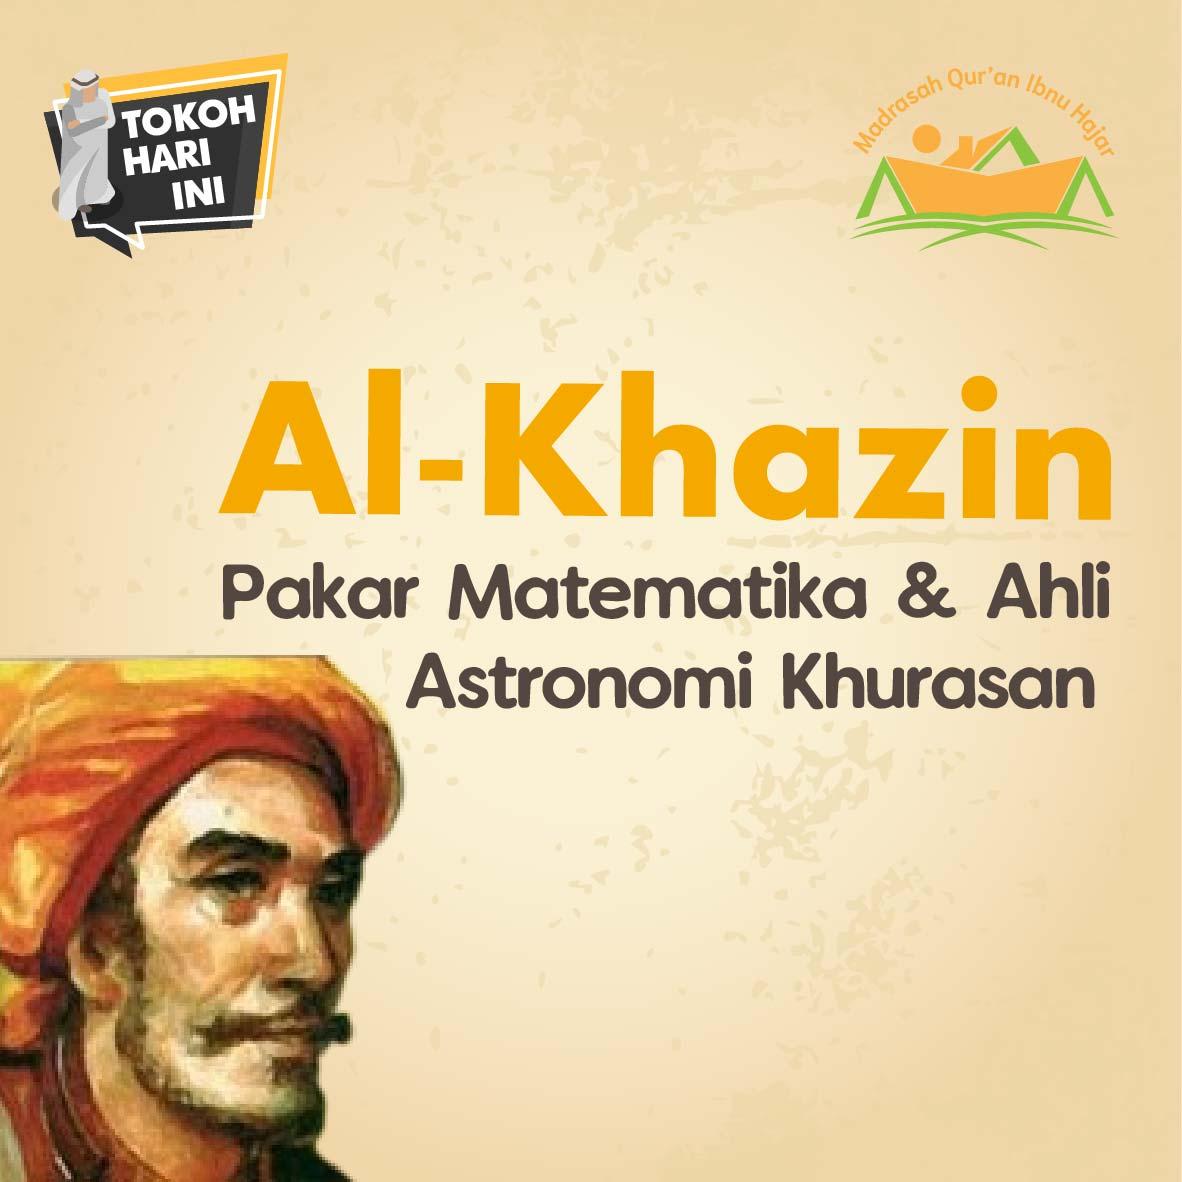 Al-Khazin Pakar Matematika Muslim